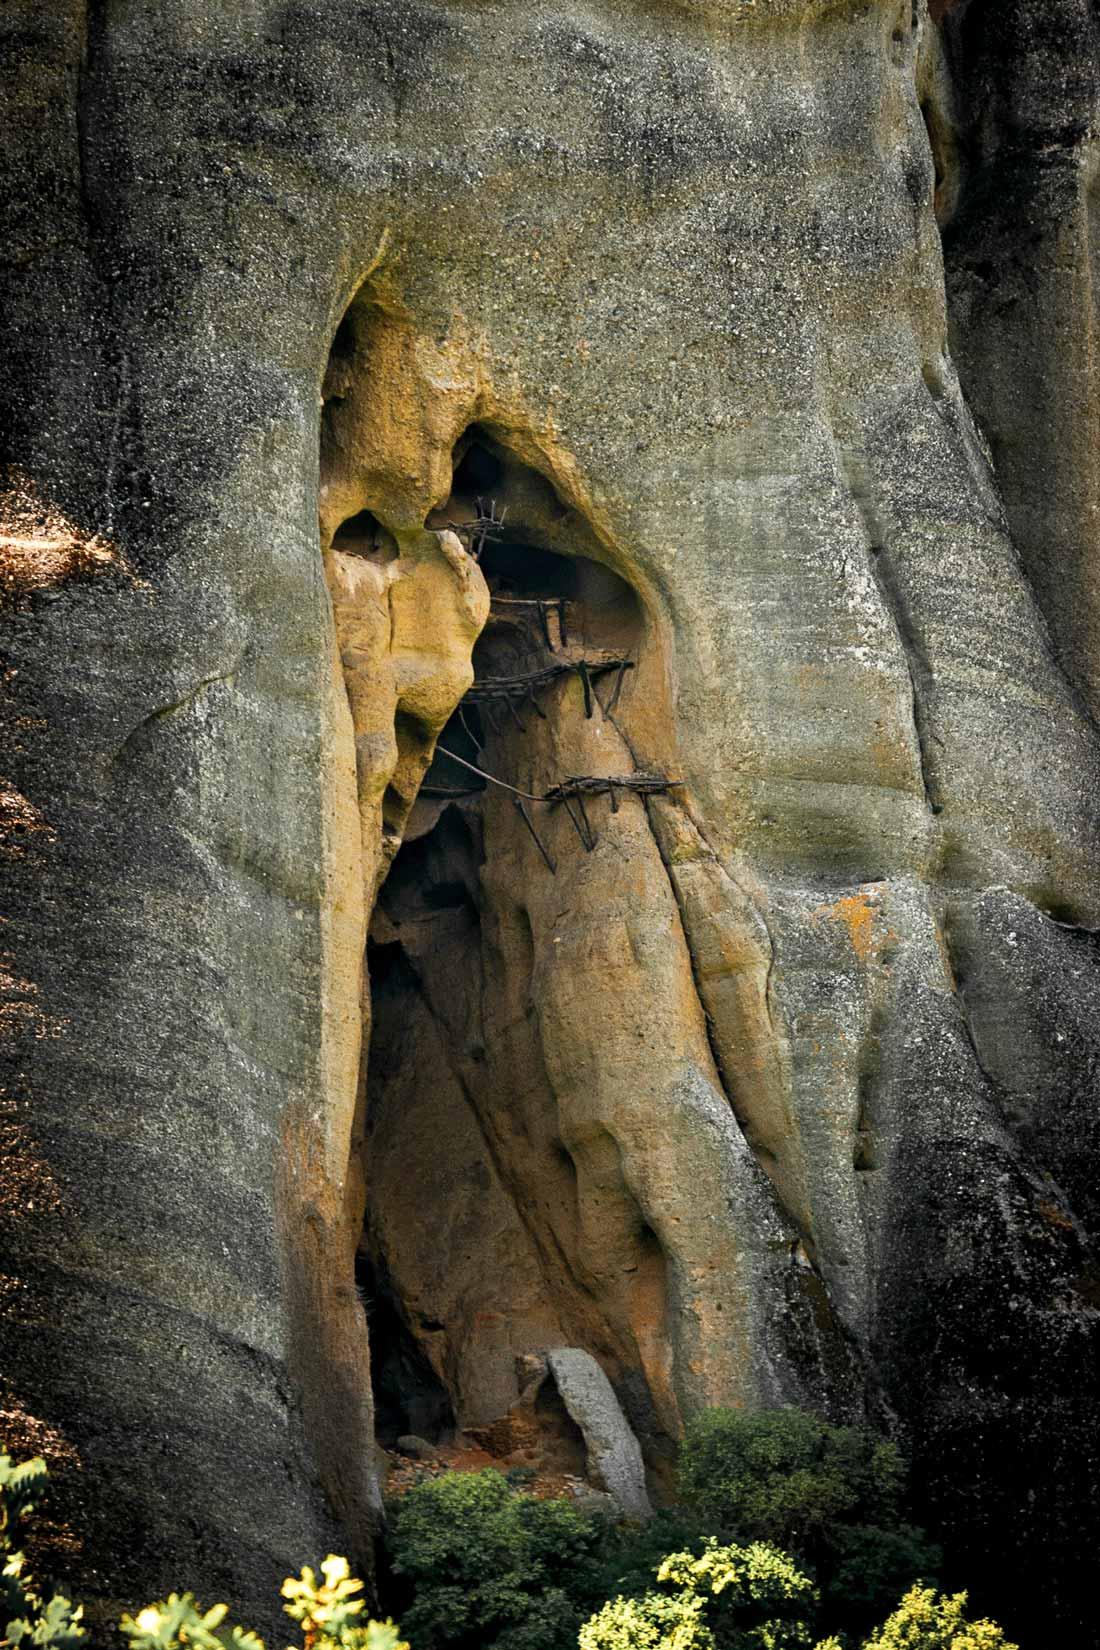 Jeskyně Παναγία τῶν Φυλακῶν